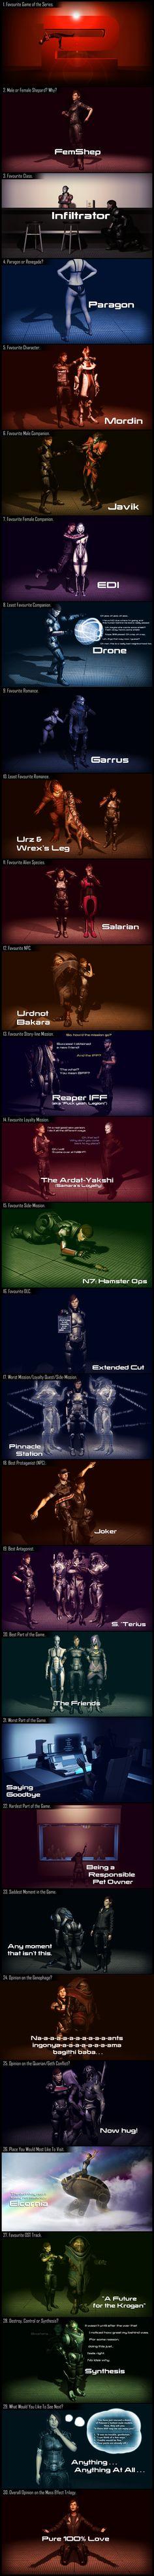 30 Day Mass Effect Challenge by ImperatorAlicia on DeviantArt